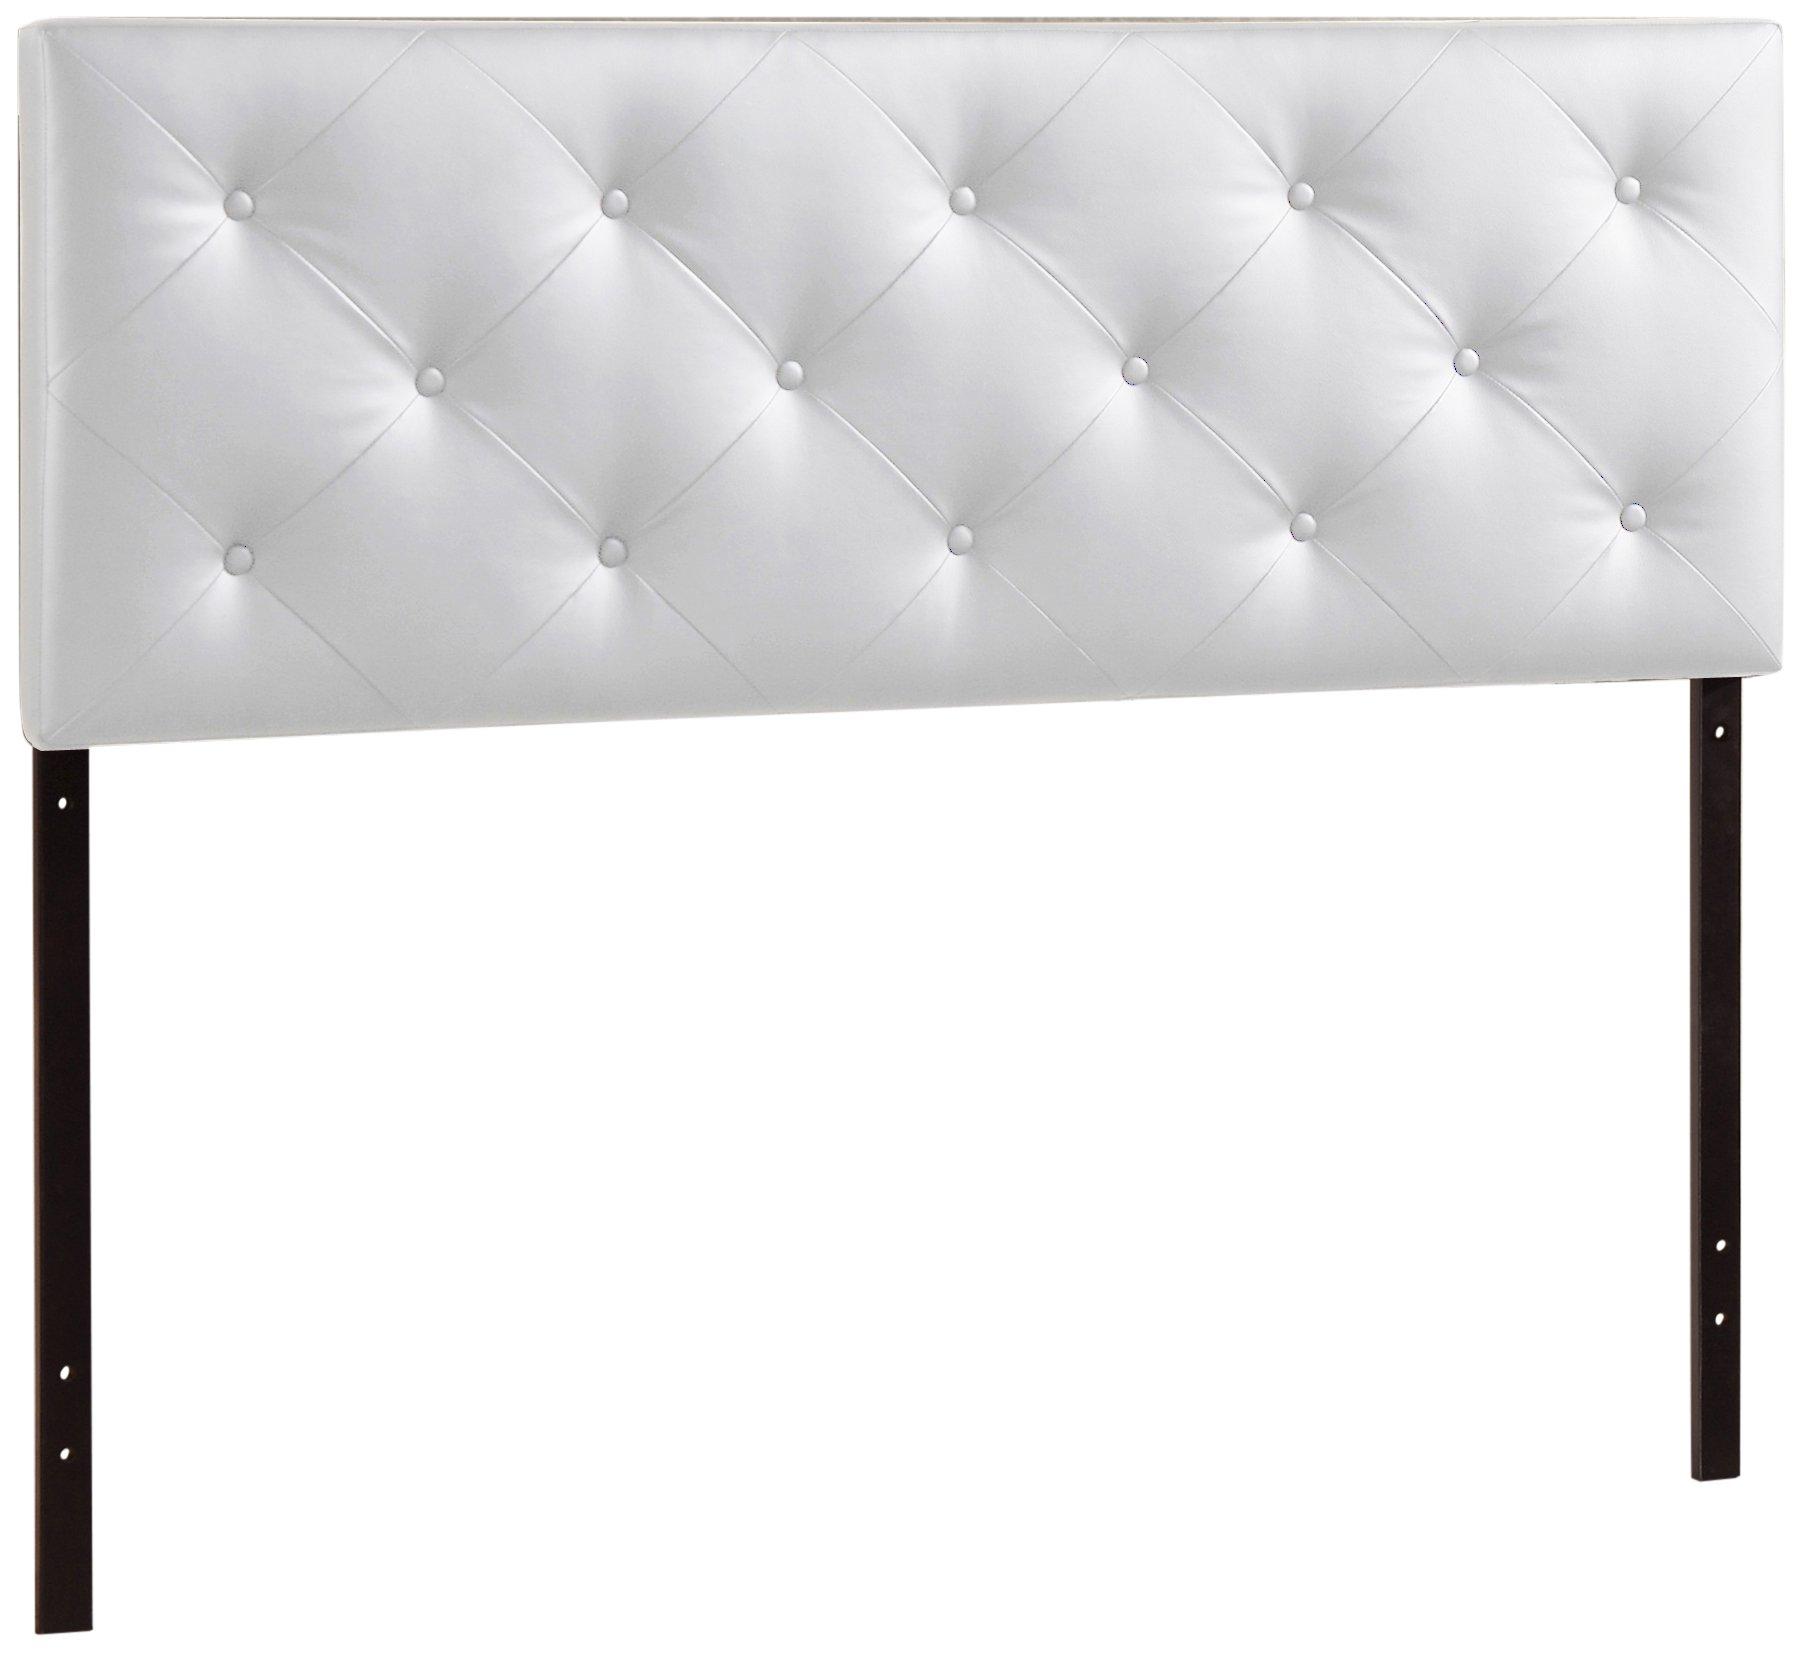 Baxton Studio Wholesale Interiors Baltimore Contemporary Faux Leather Headboard, Queen, White